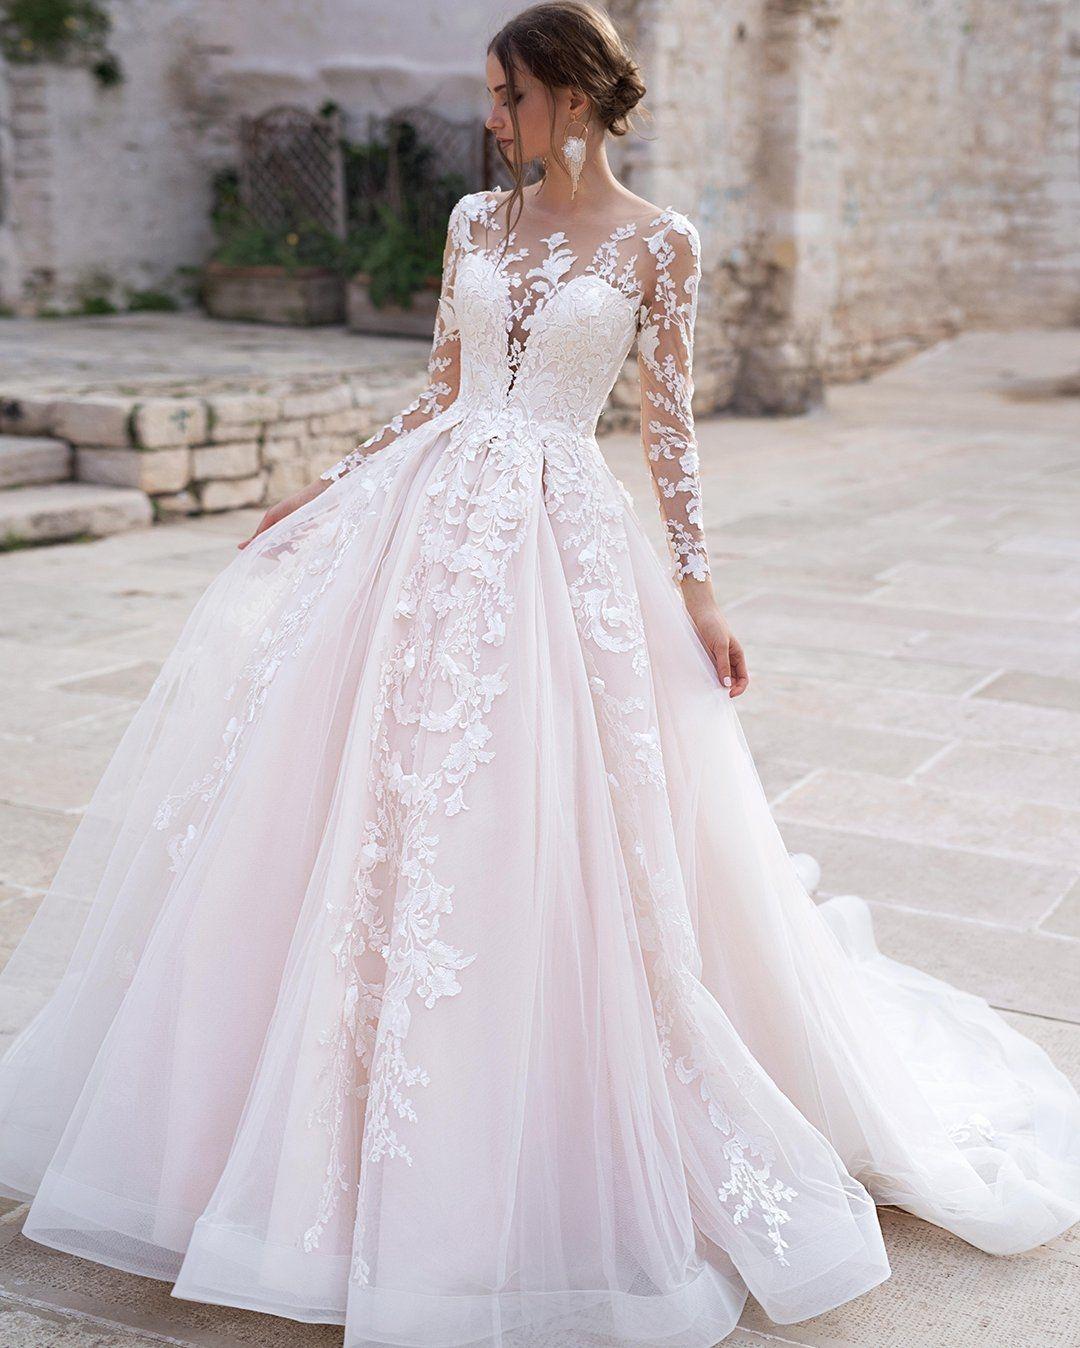 Blunny on instagram blunny sensation royal dress